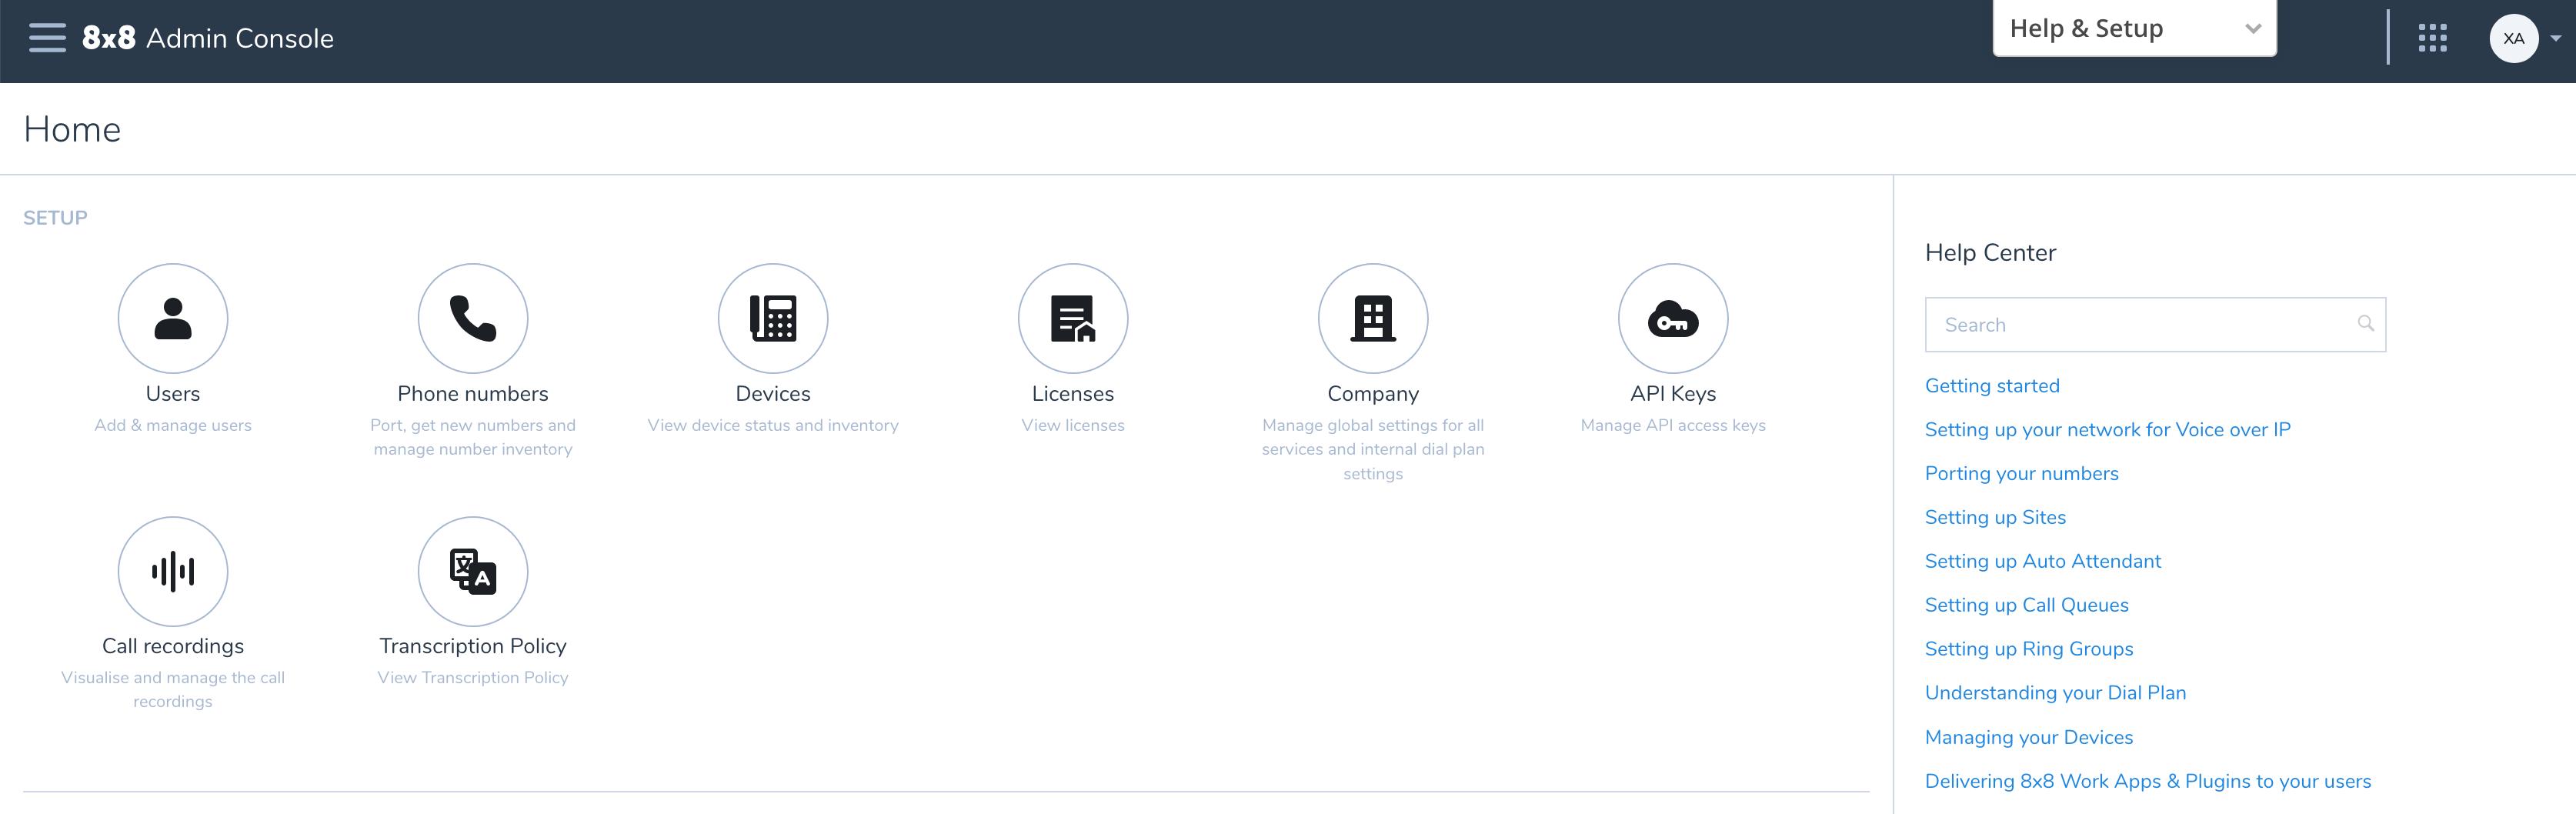 Admin Console Home Page